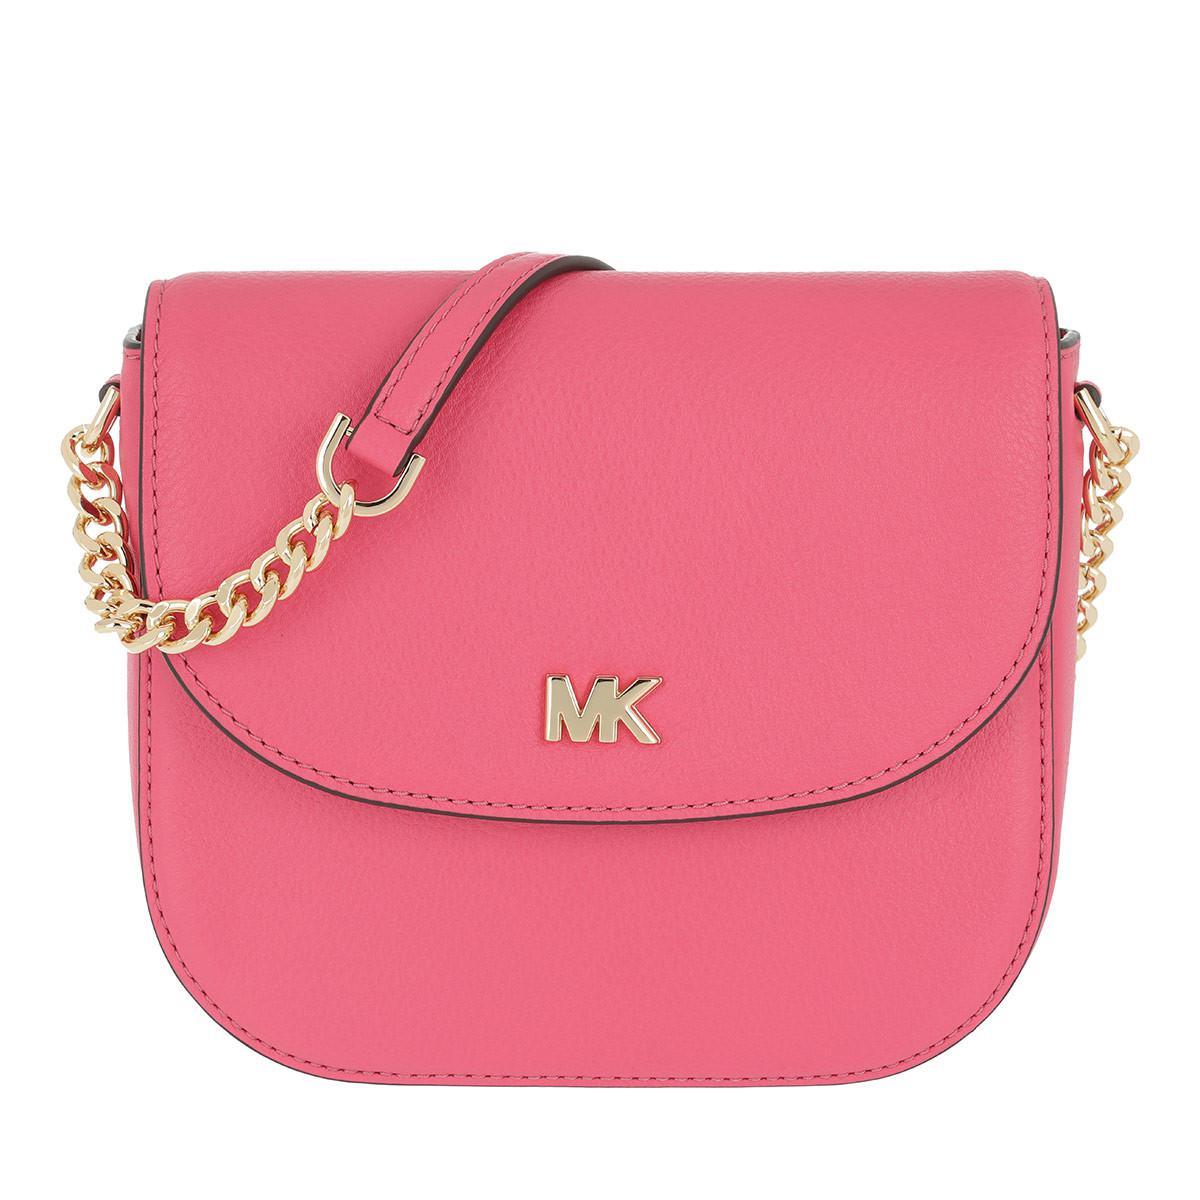 9f7b714acfa752 Michael Kors Half Dome Crossbody Bag Rose Pink in Pink - Lyst